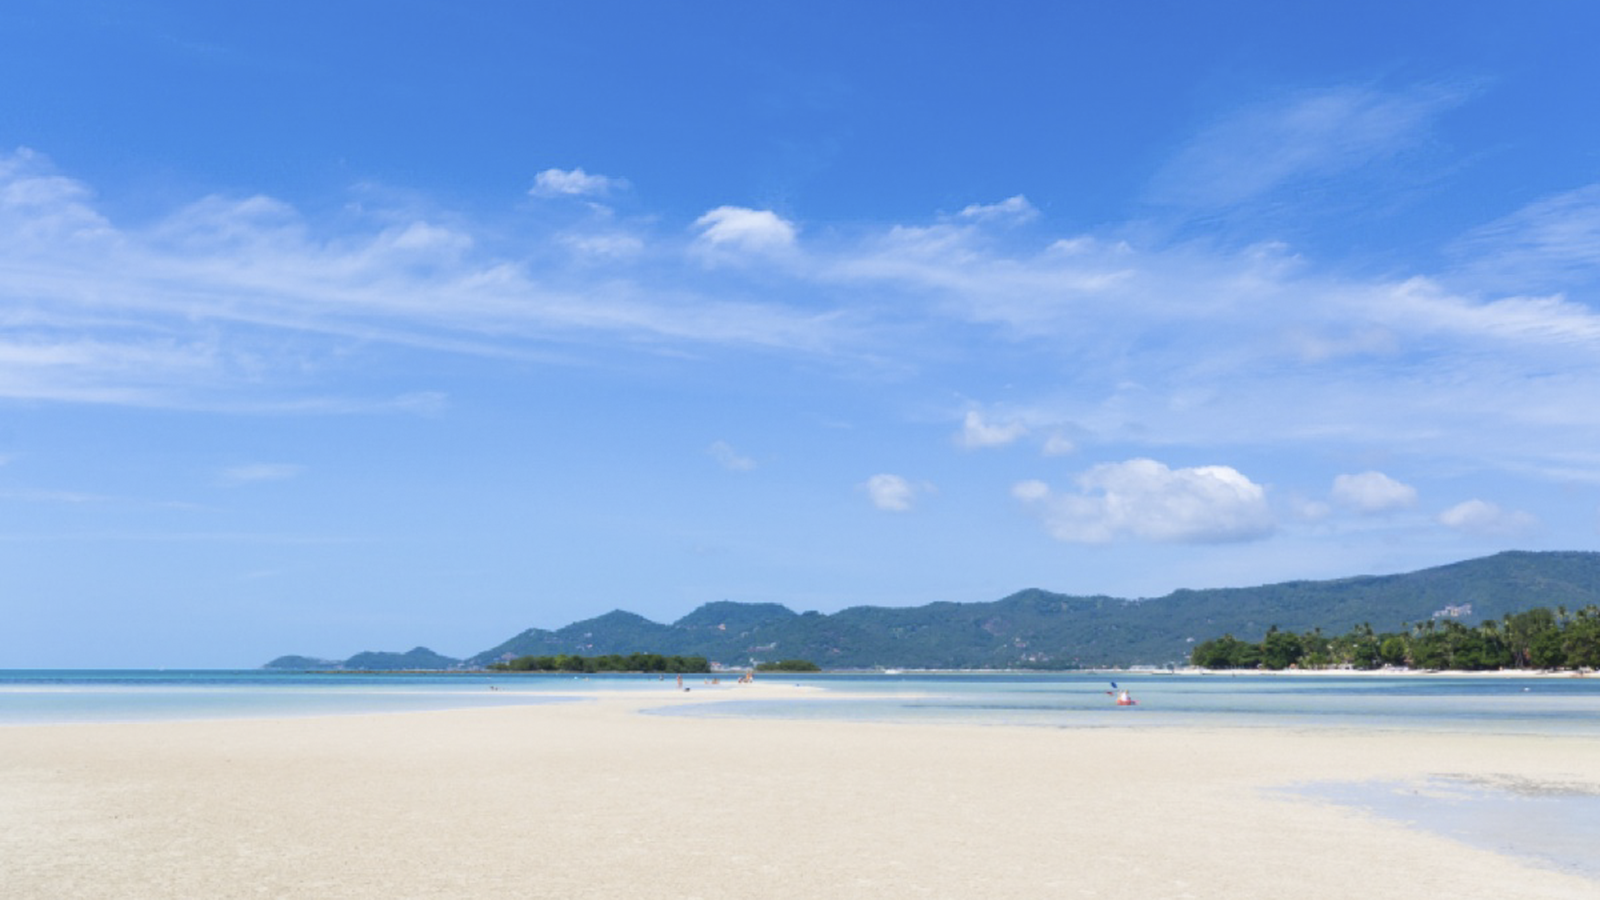 Traveling to Koh Samui? Insiders share tips | CNN Travel